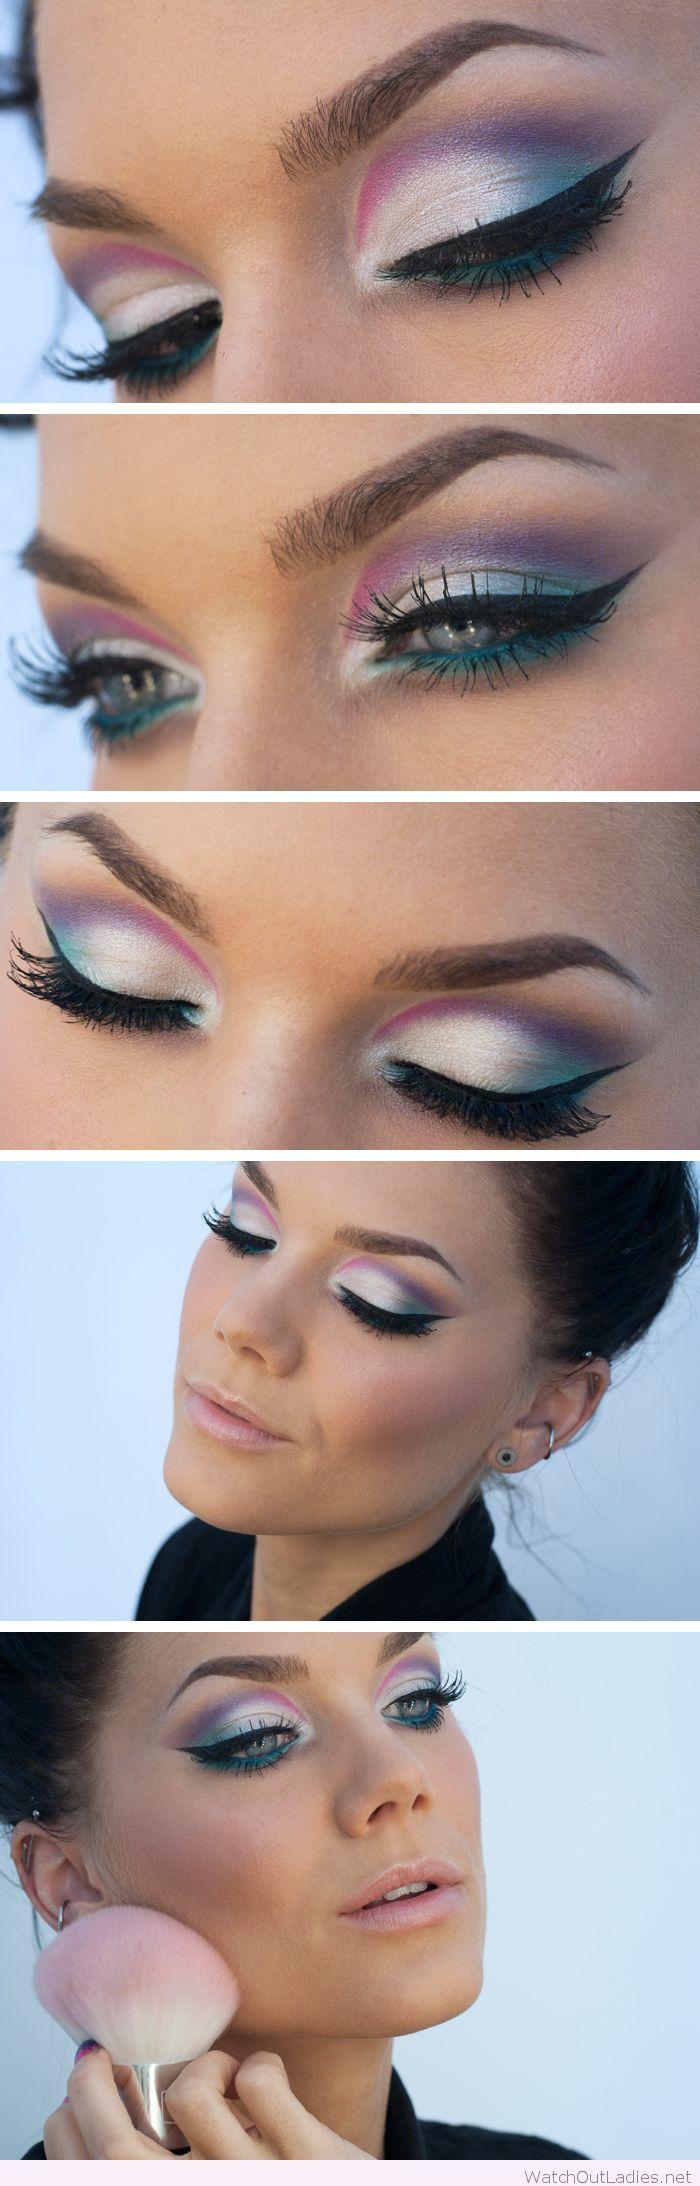 Purple, silver and blue eye make-up inspiration